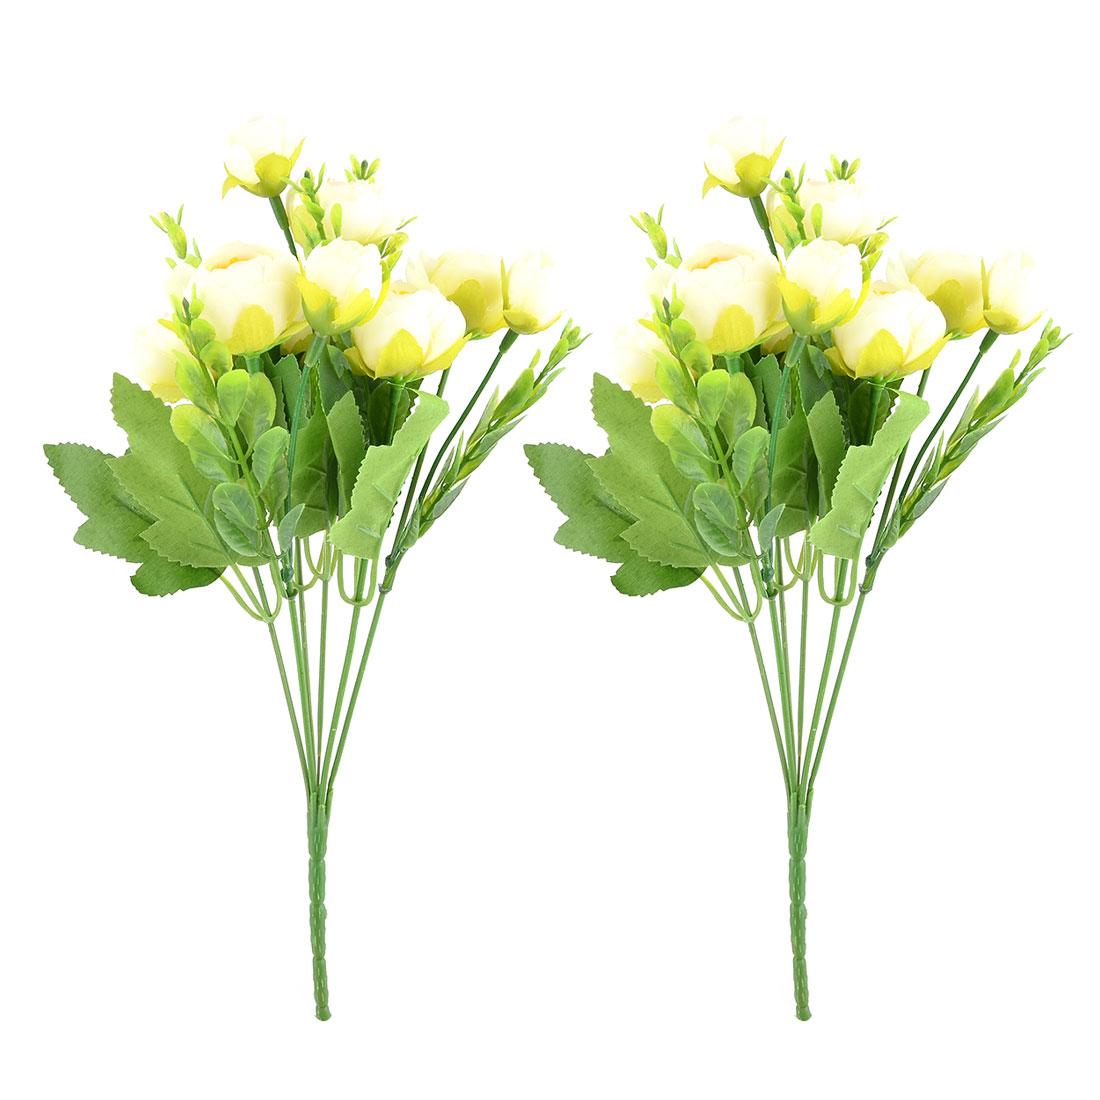 Wedding Fabric Camellia Shaped Craft Decor Artificial Flower Bouquet Beige 2pcs